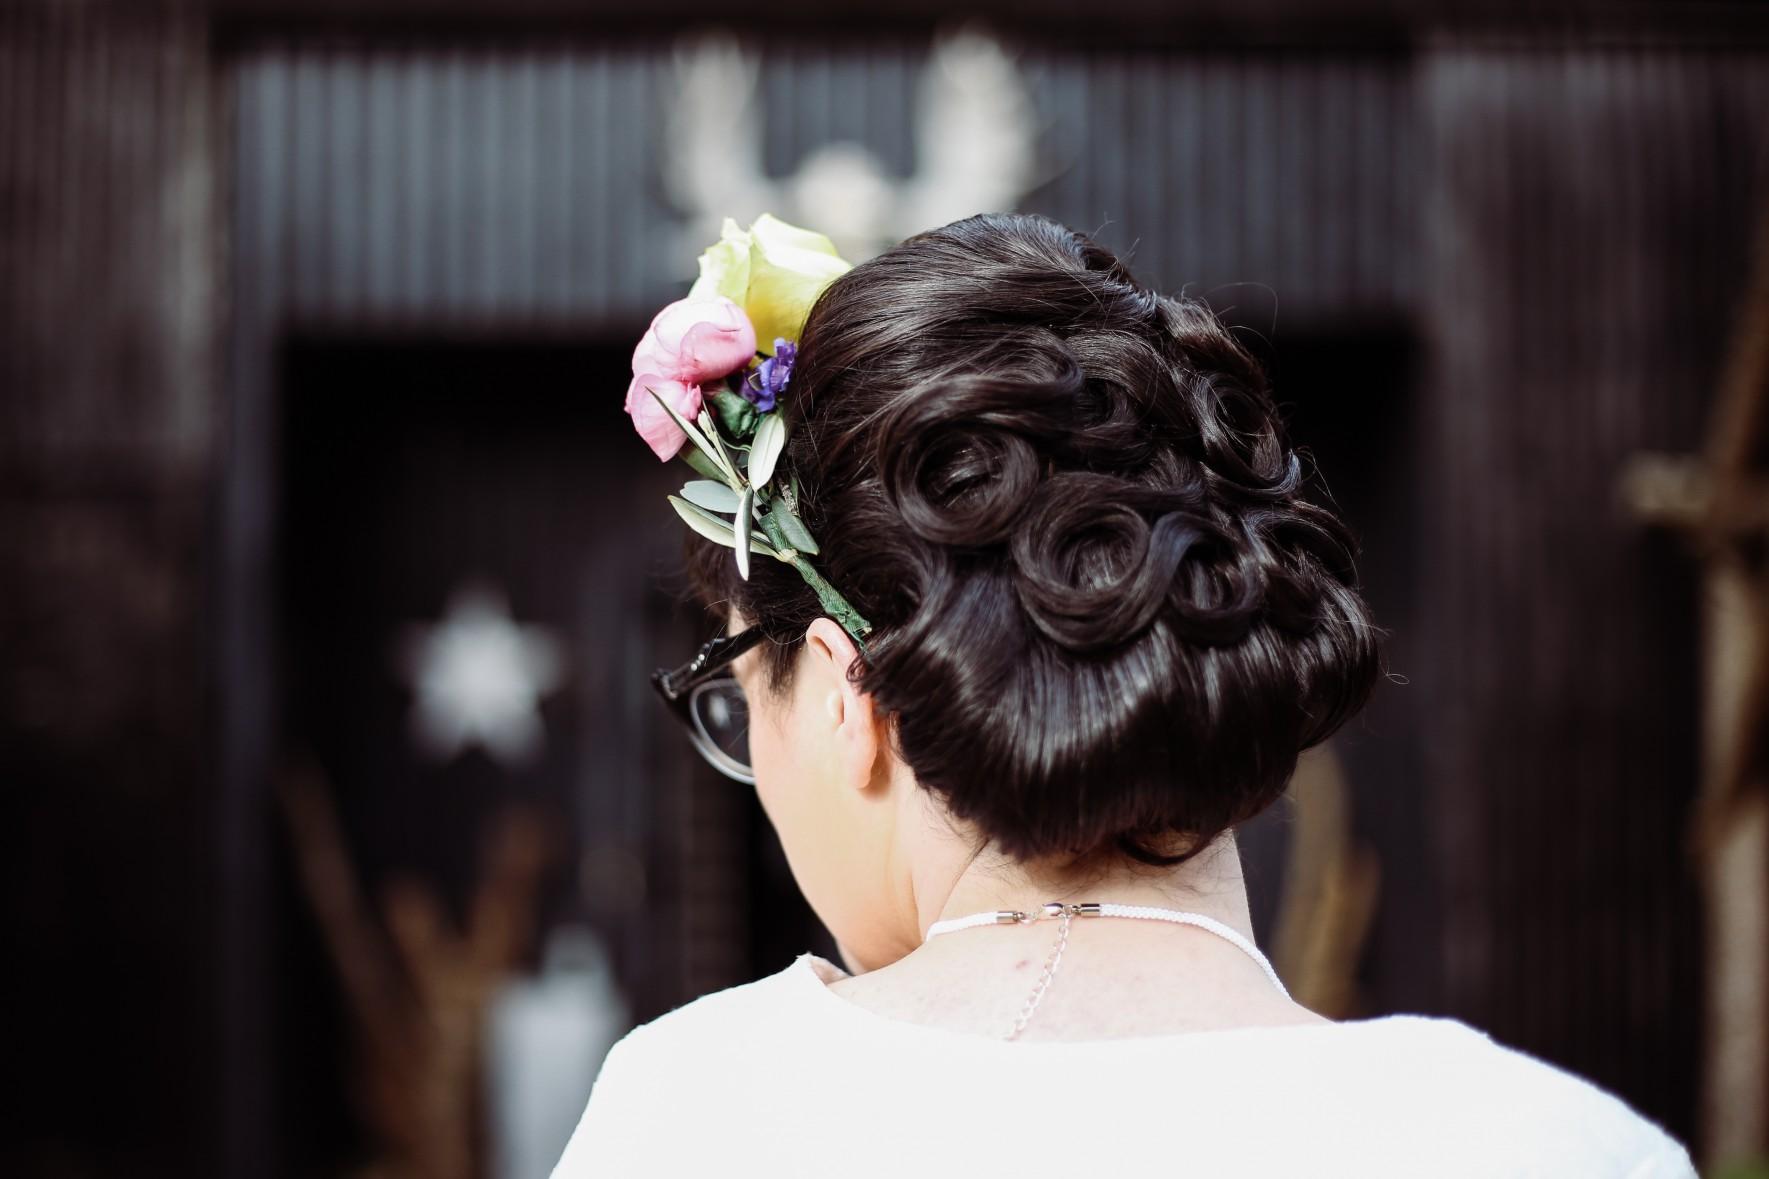 Becky Payne Photographer - Rainbow Unicorn Styled Wedding Shoot - Woods - Hair